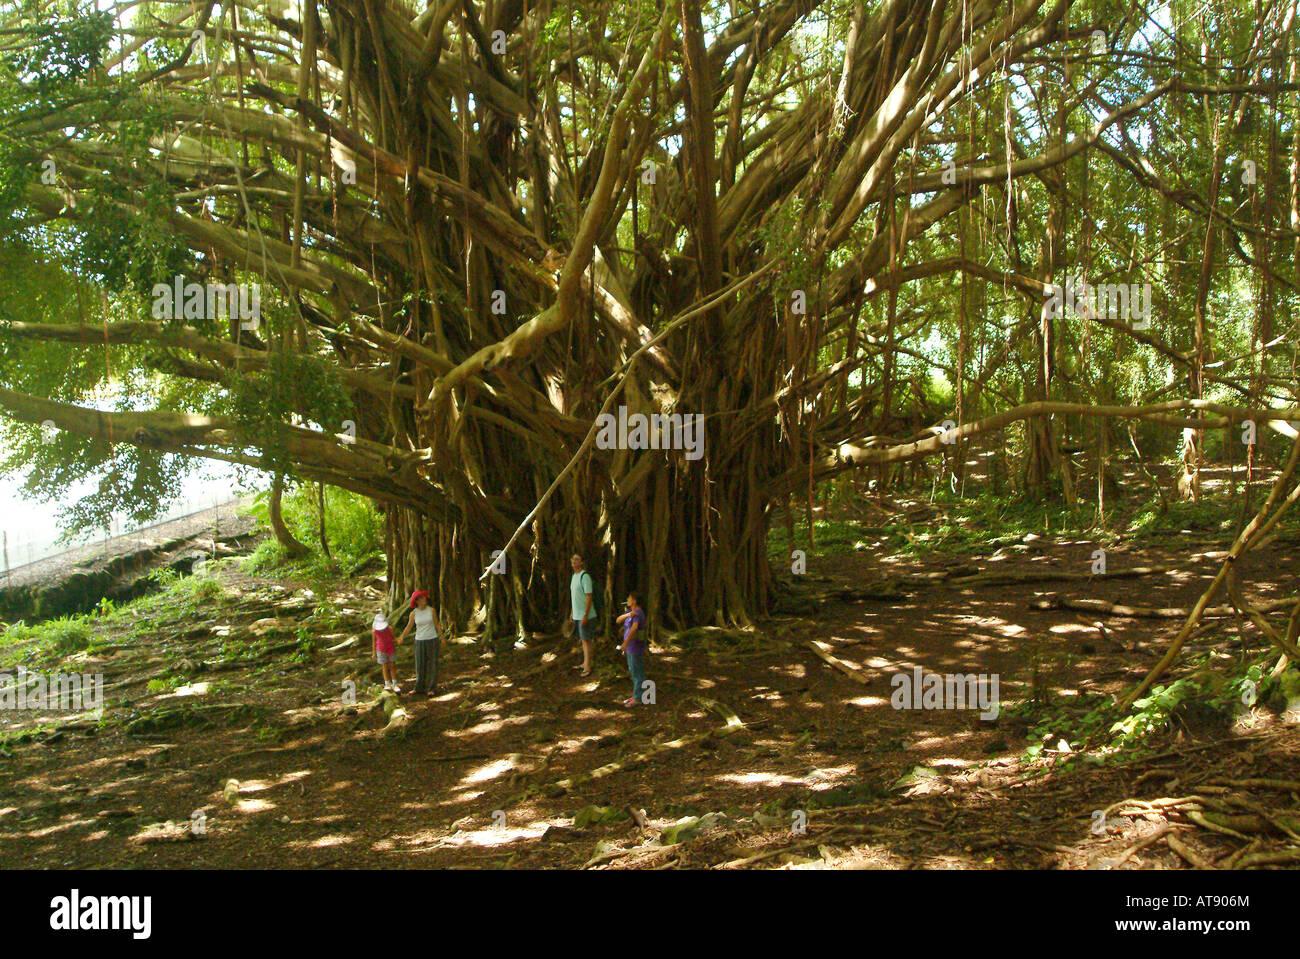 Très grand arbre banyan près de Anuenue falls à Hilo. Nom latin: Ficus benghalensis Banque D'Images